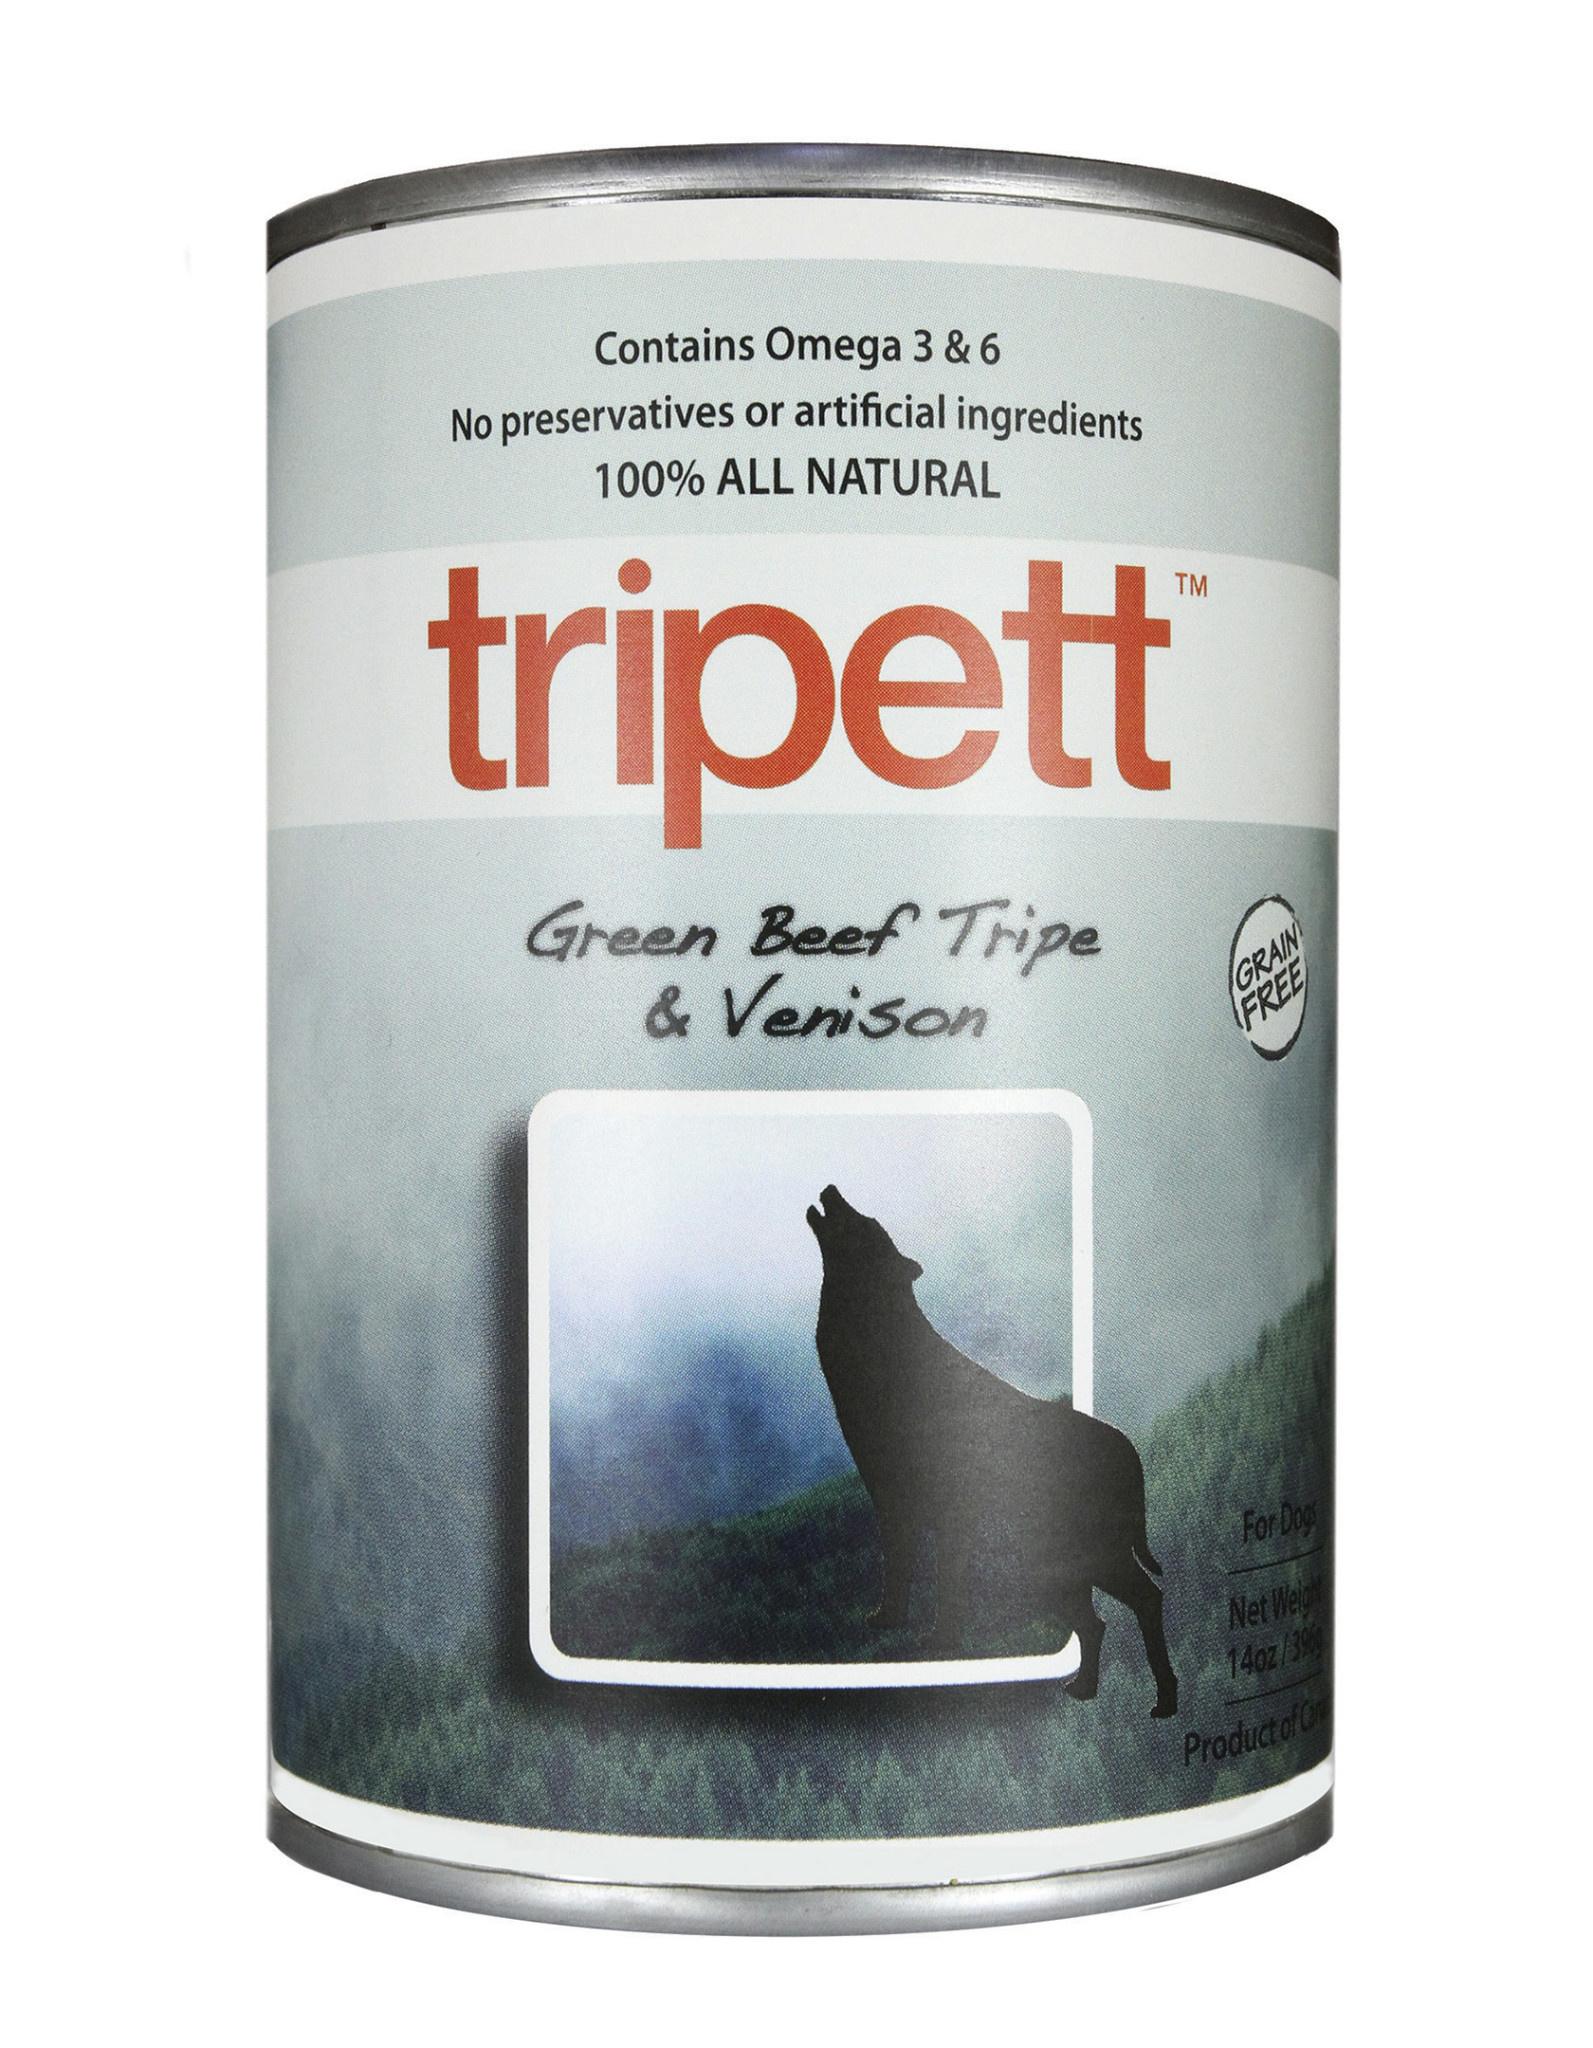 PetKind Tripett Green Beef Tripe & Venison Can, 14oz